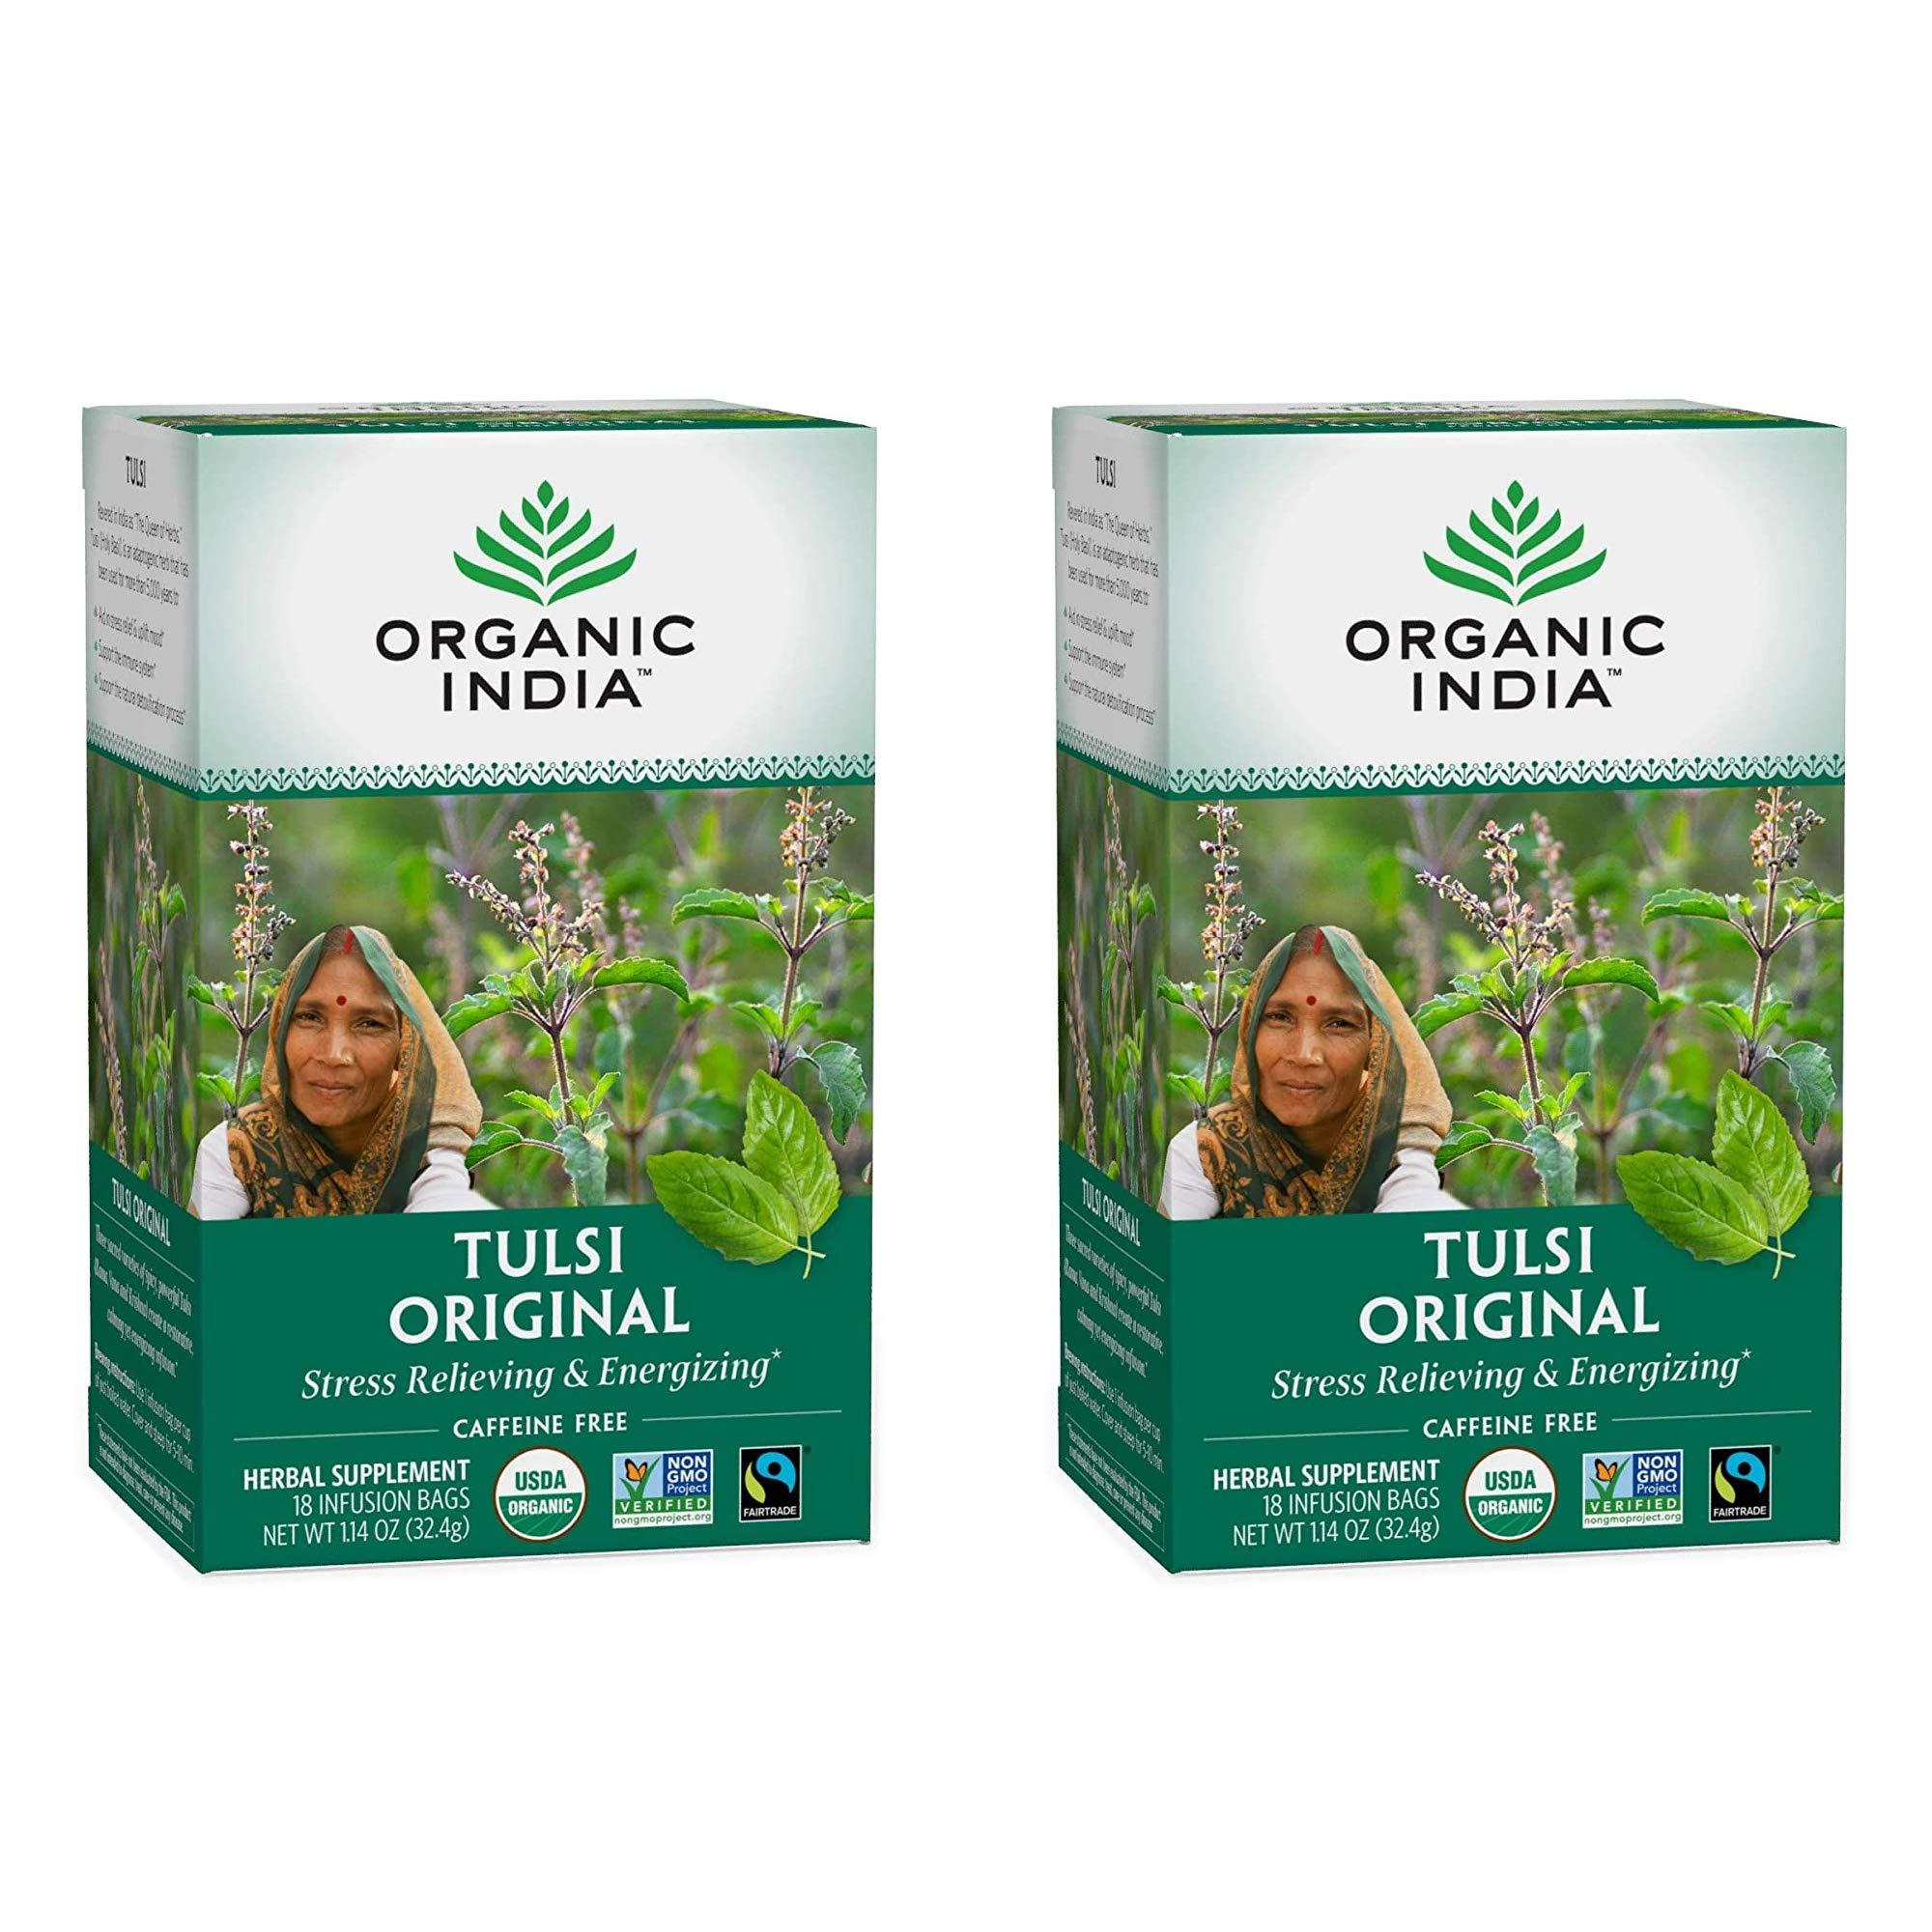 Organic India Tulsi Original Herbal Tea - Stress Relieving & Energizing, Immune Support, Adaptogen, Vegan, Gluten-Free, USDA Certified Organic, Non-GMO, Caffeine-Free - 18 Infusion Bags, 2 Pack